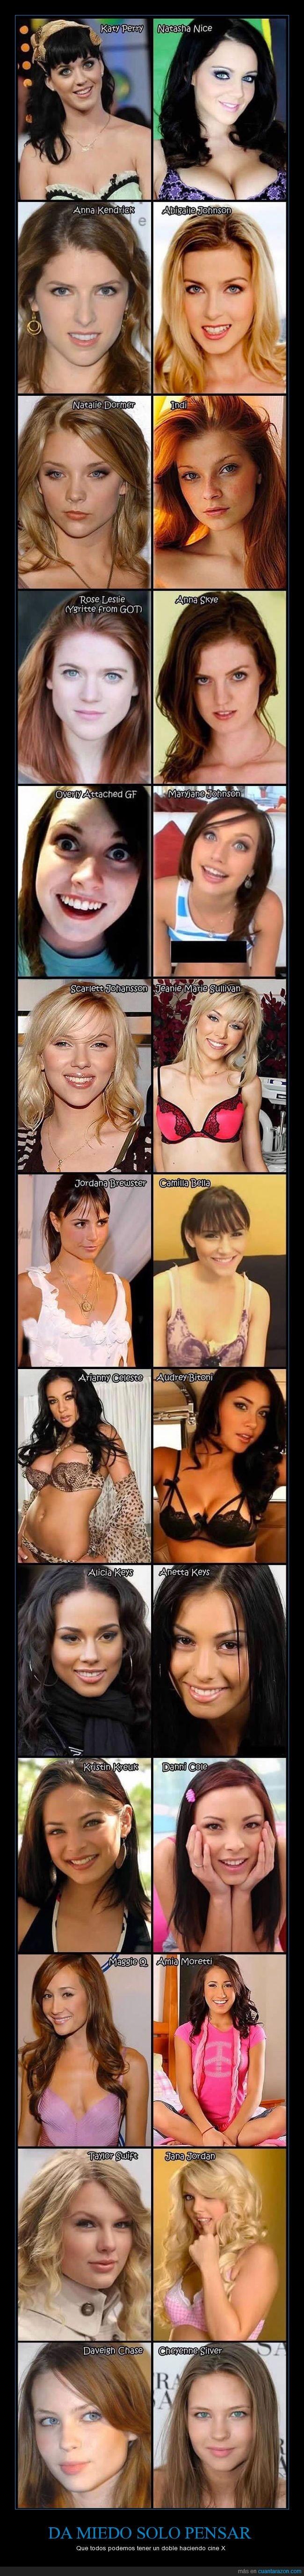 actrices,cine x,dobles,películas,x